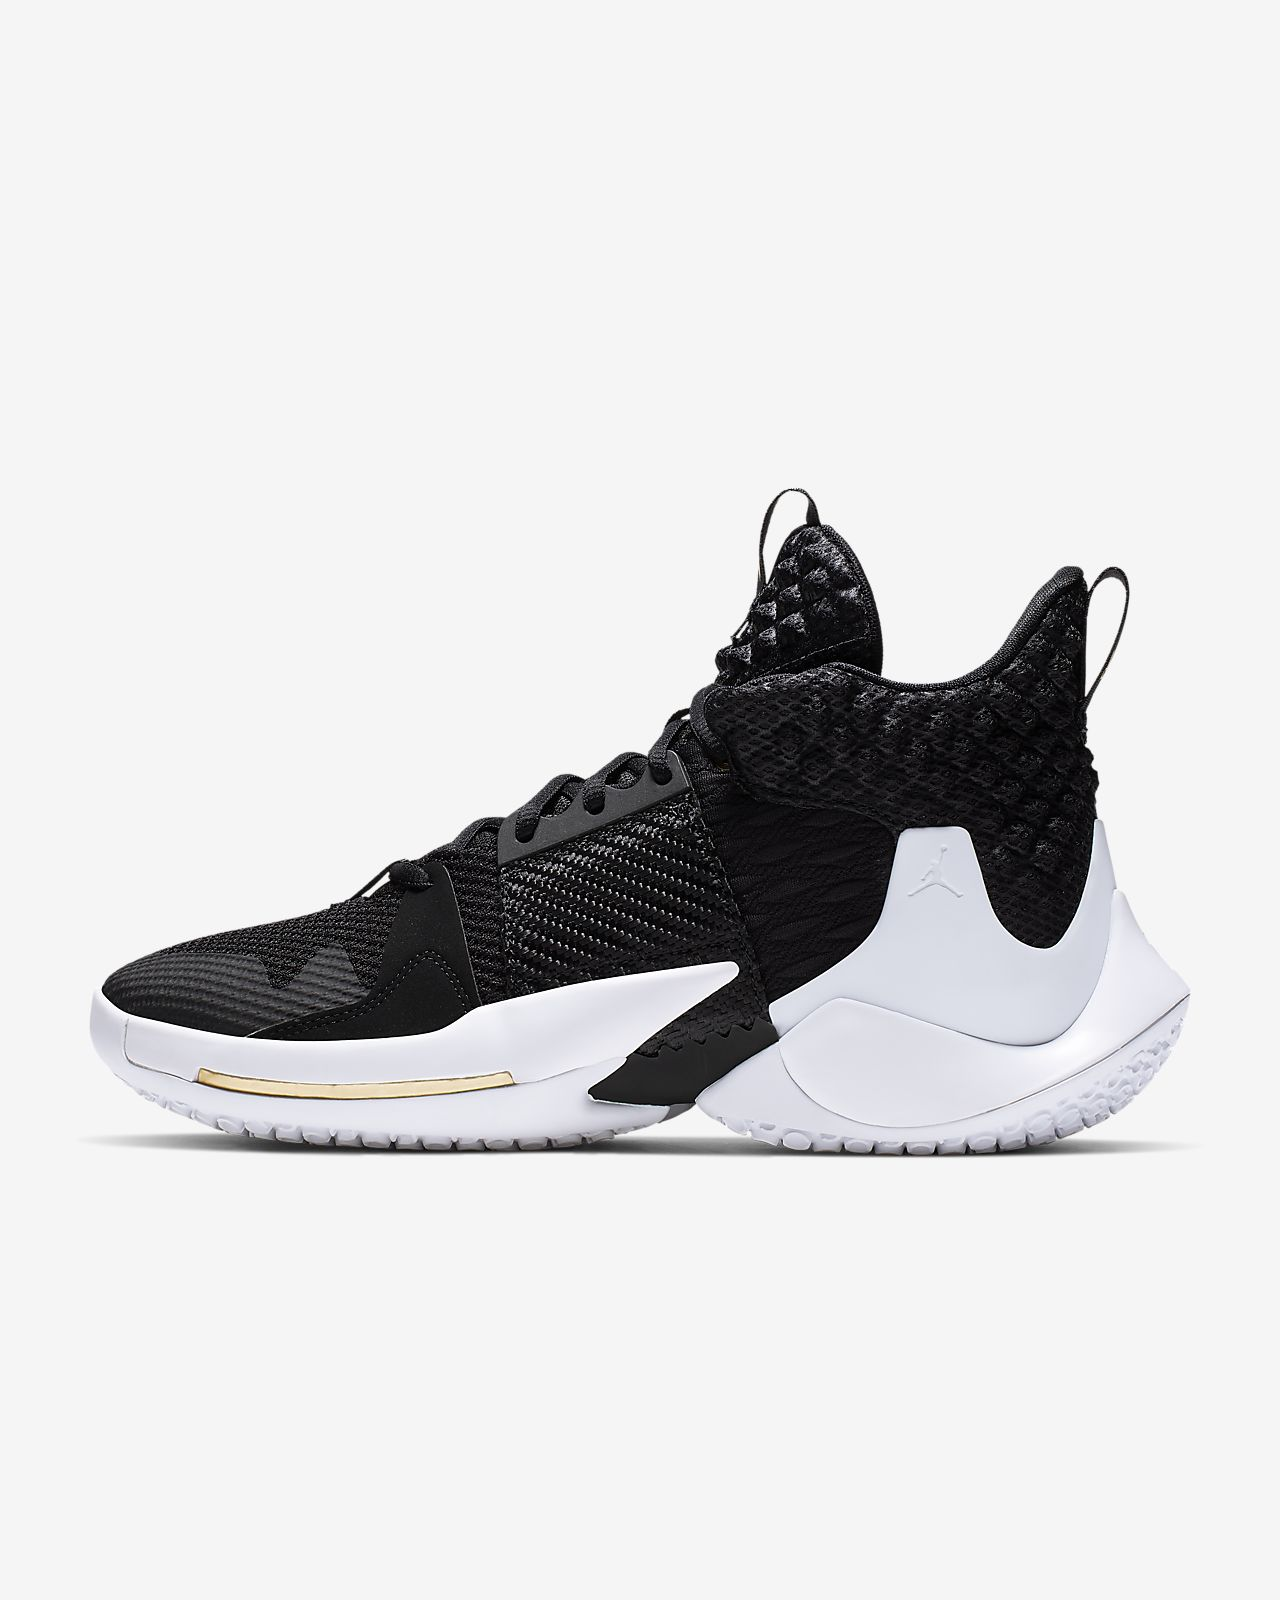 low priced 6fa54 97844 Zer0.2 Calzado de básquetbol para hombre Jordan